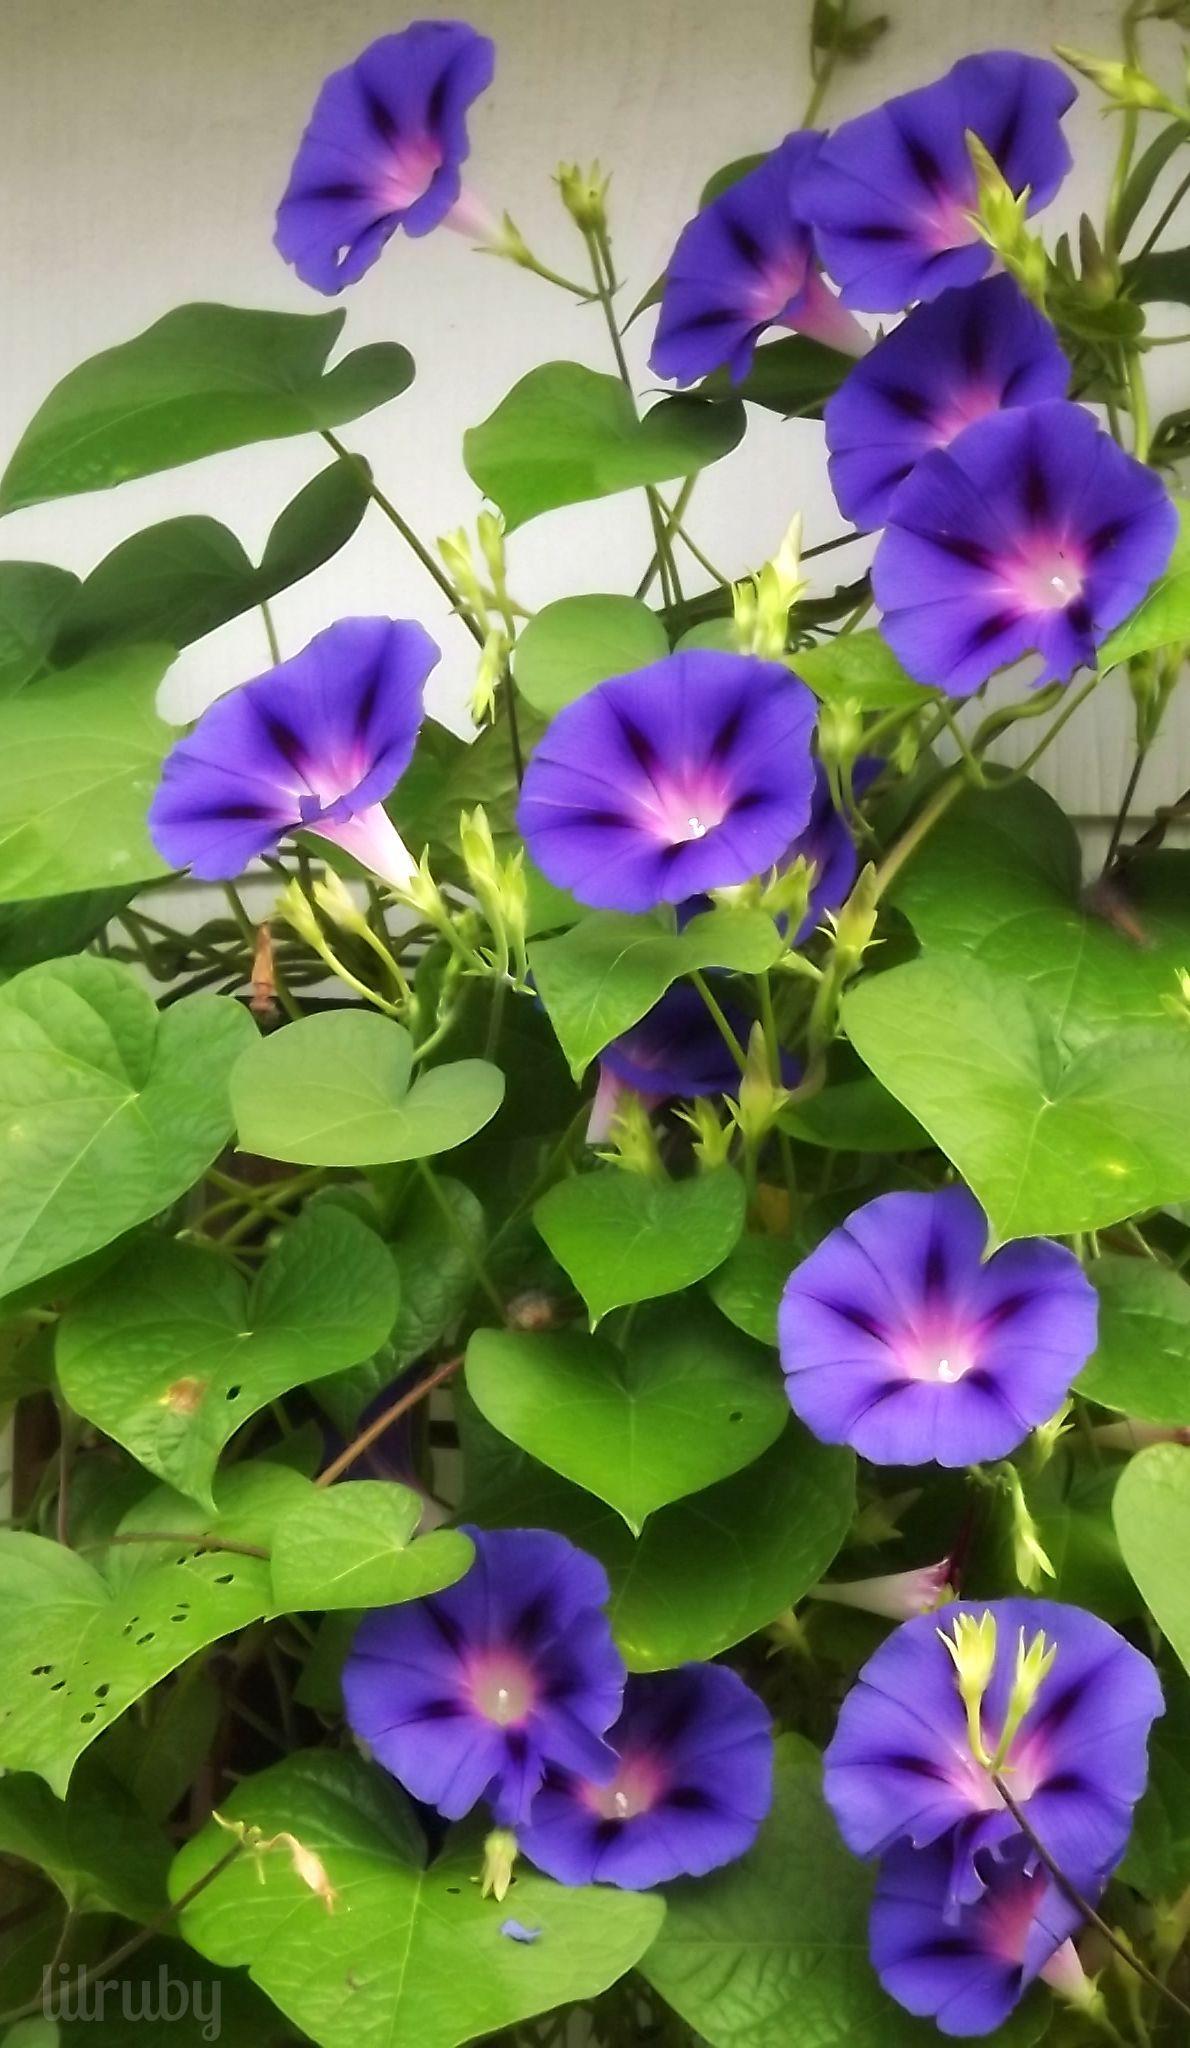 Morning Glories One Of The Joys Of September Morning Glory Flowers Flower Garden Pretty Flowers